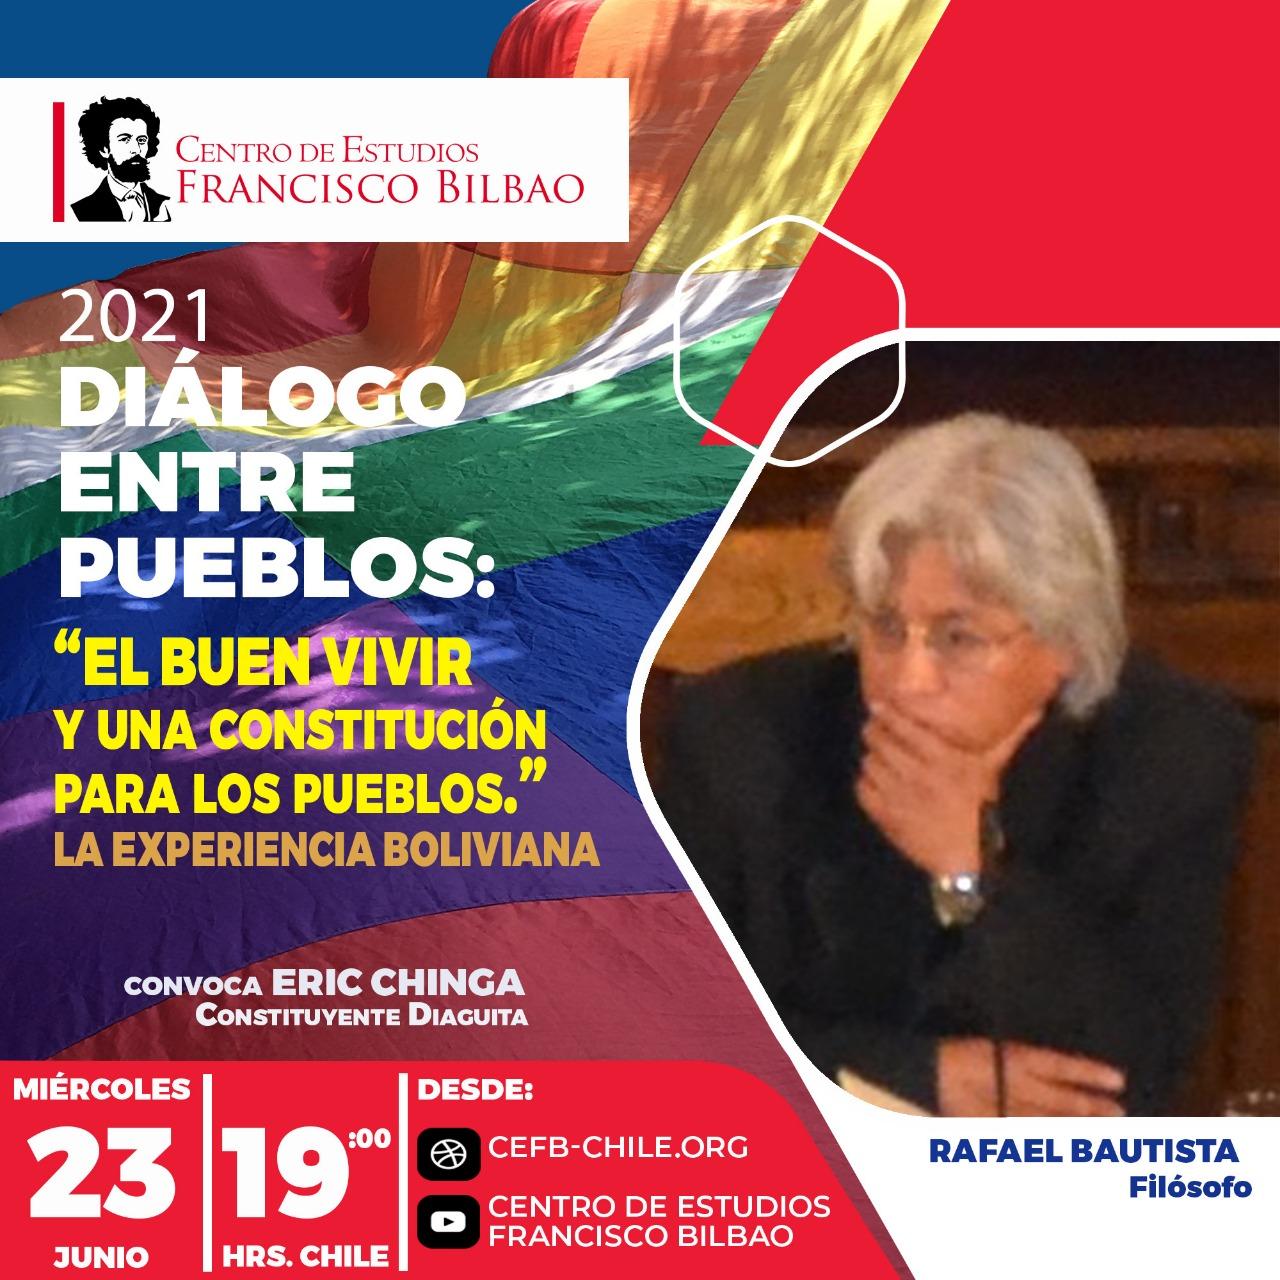 Diálogo entre pueblos: Rafael Bautista de Bolivia, Eric Chinga constituyente Diaguita-Chile